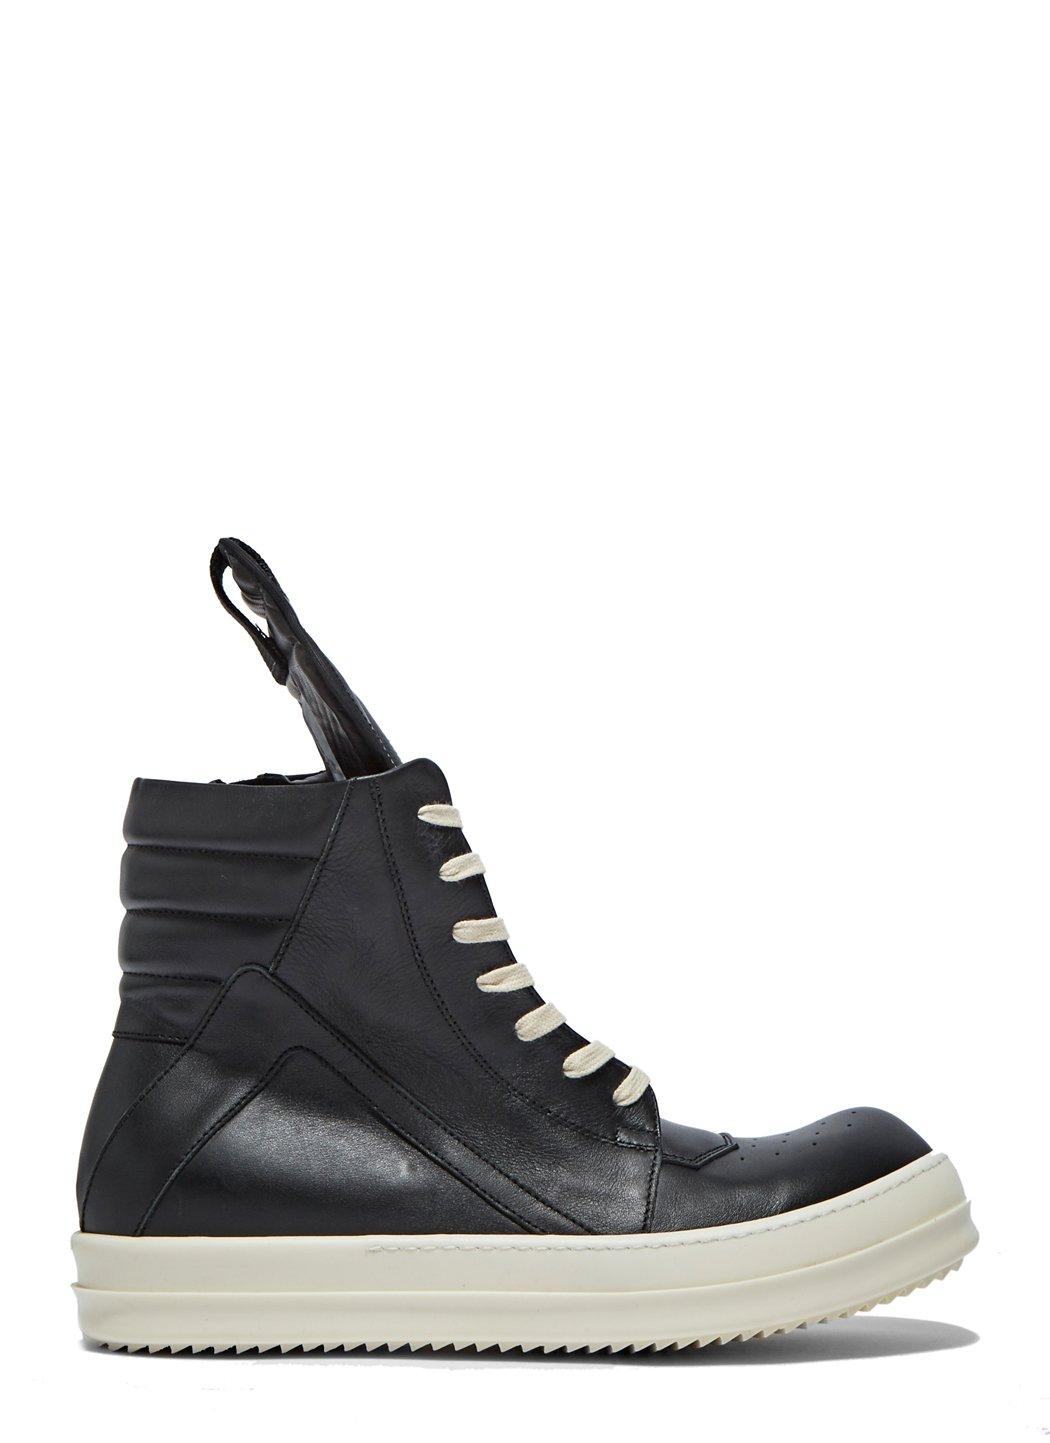 lyst rick owens men 39 s leather geobasket sneakers in black in black for men. Black Bedroom Furniture Sets. Home Design Ideas